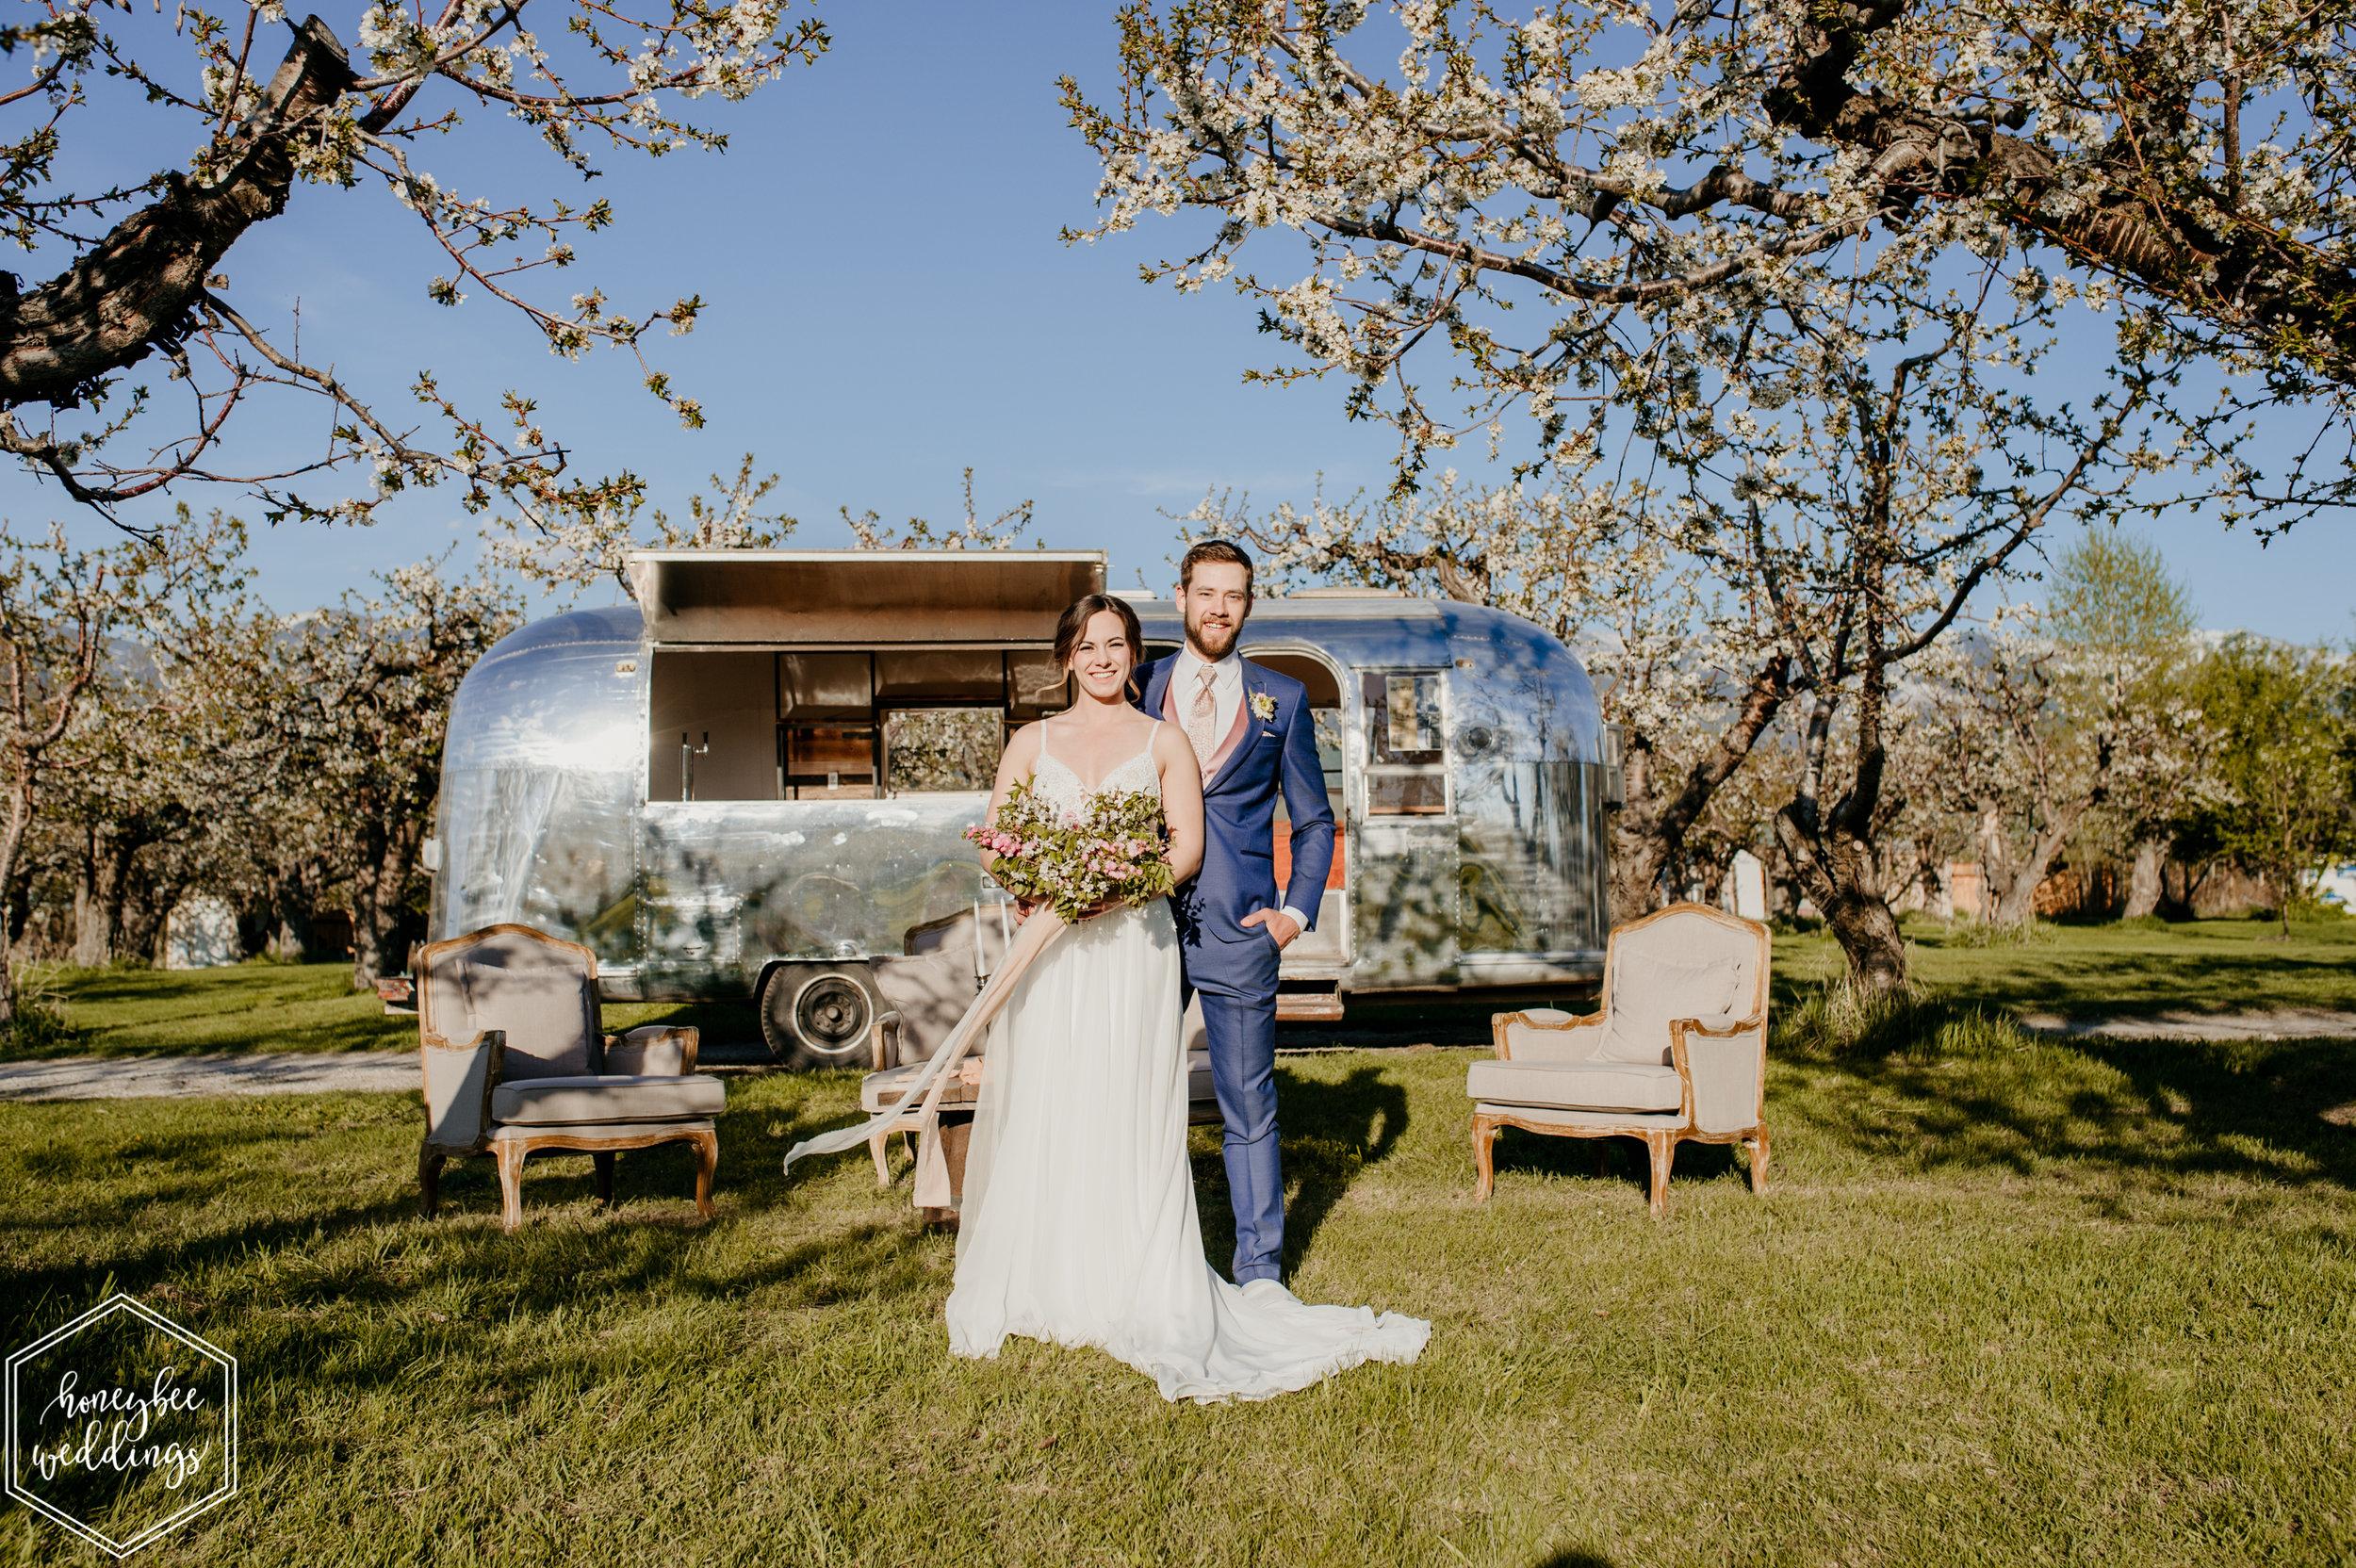 086Cherry Blossom Wedding_Styled Photoshoot_Honeybee Weddings_May 11, 2019-136.jpg